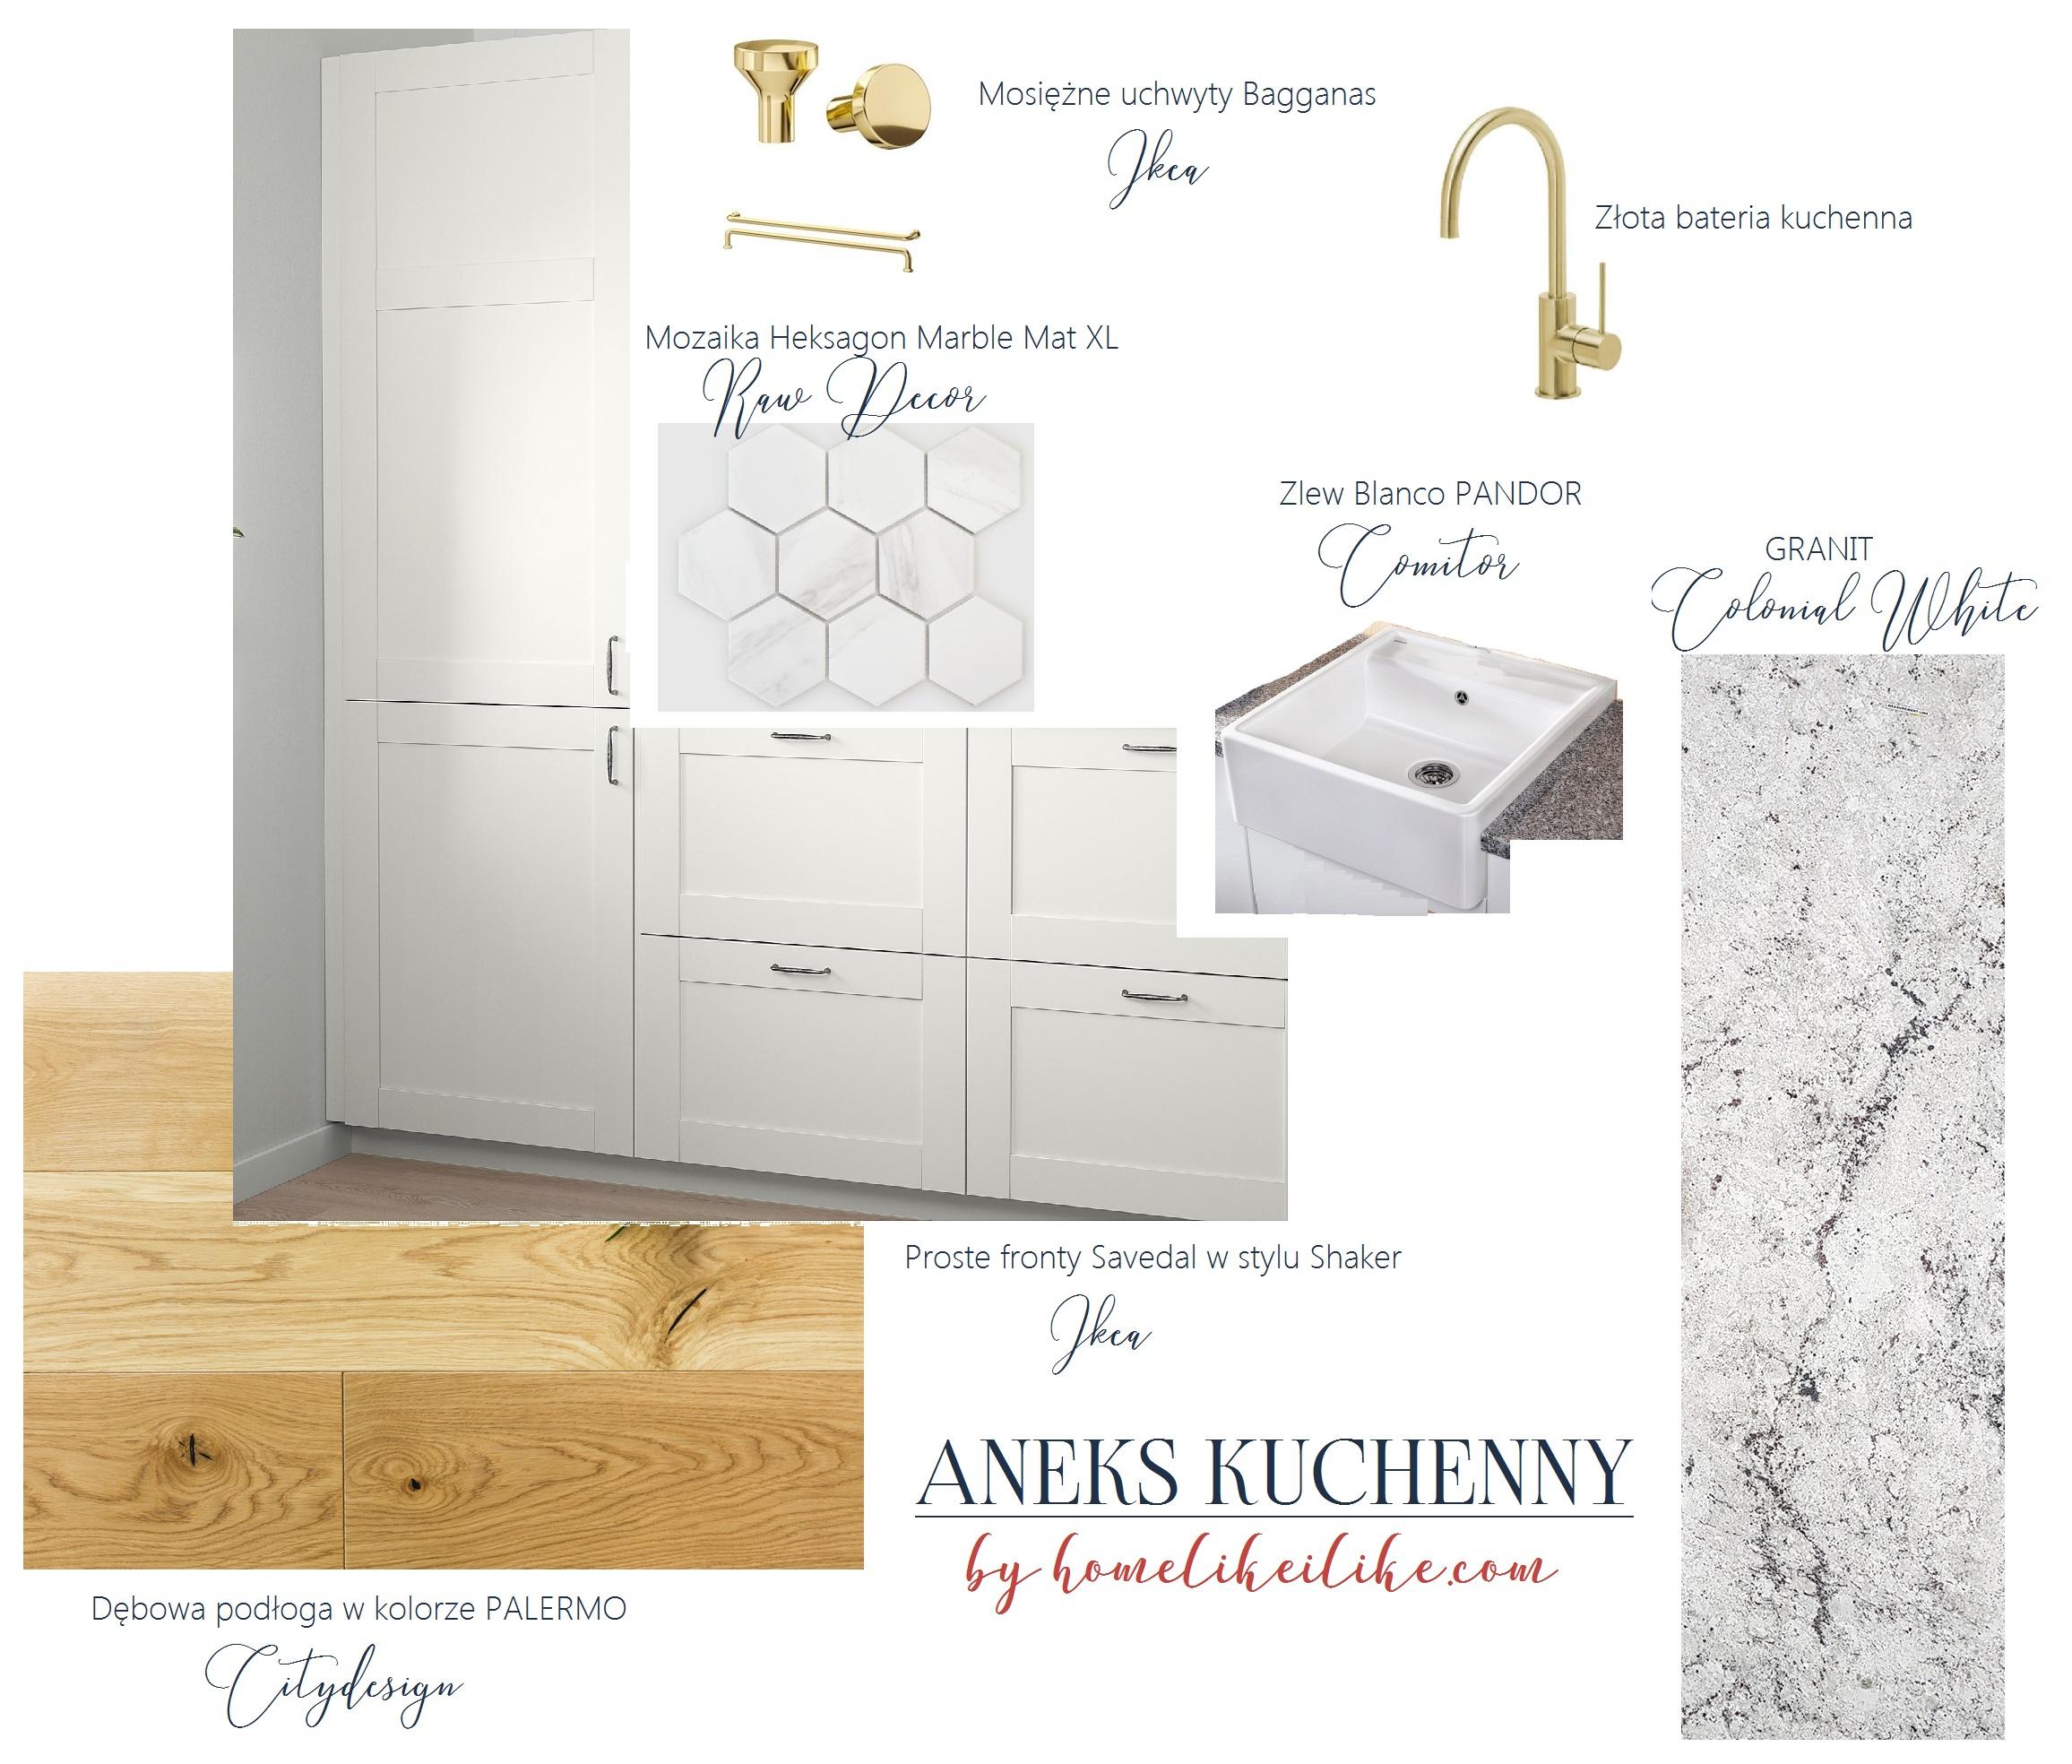 aneks kuchenny projekt - homelikeilike.com